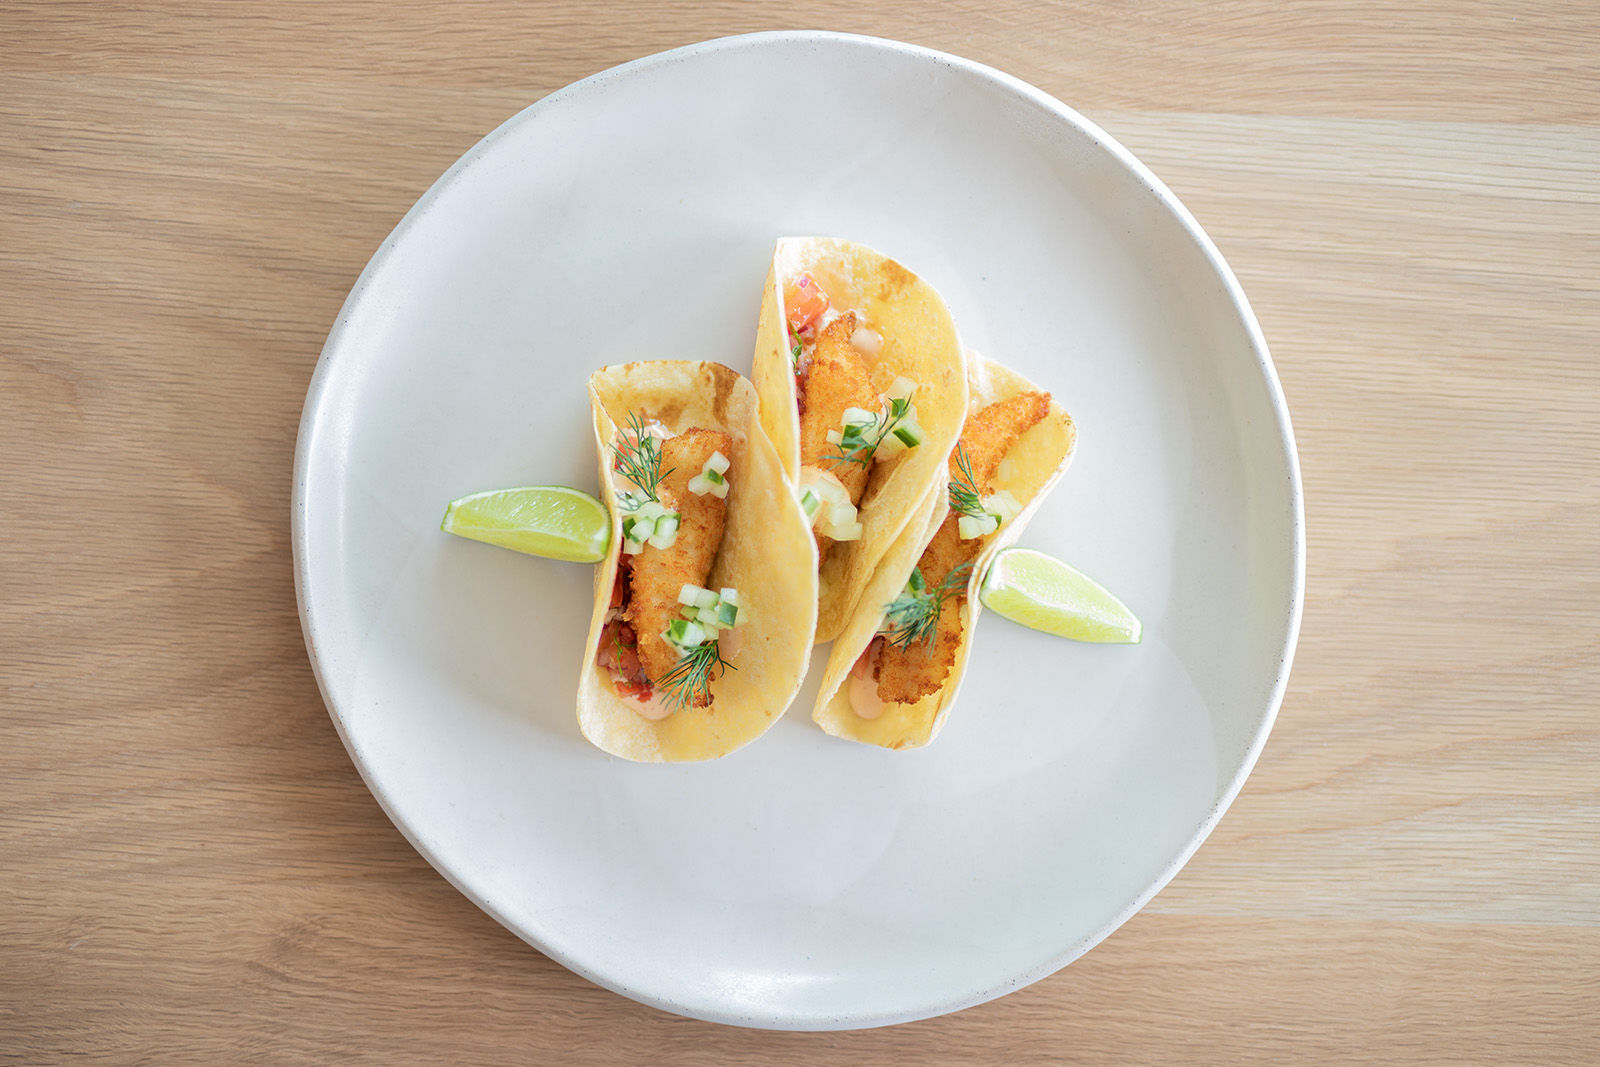 The Coast - soft shell tacos